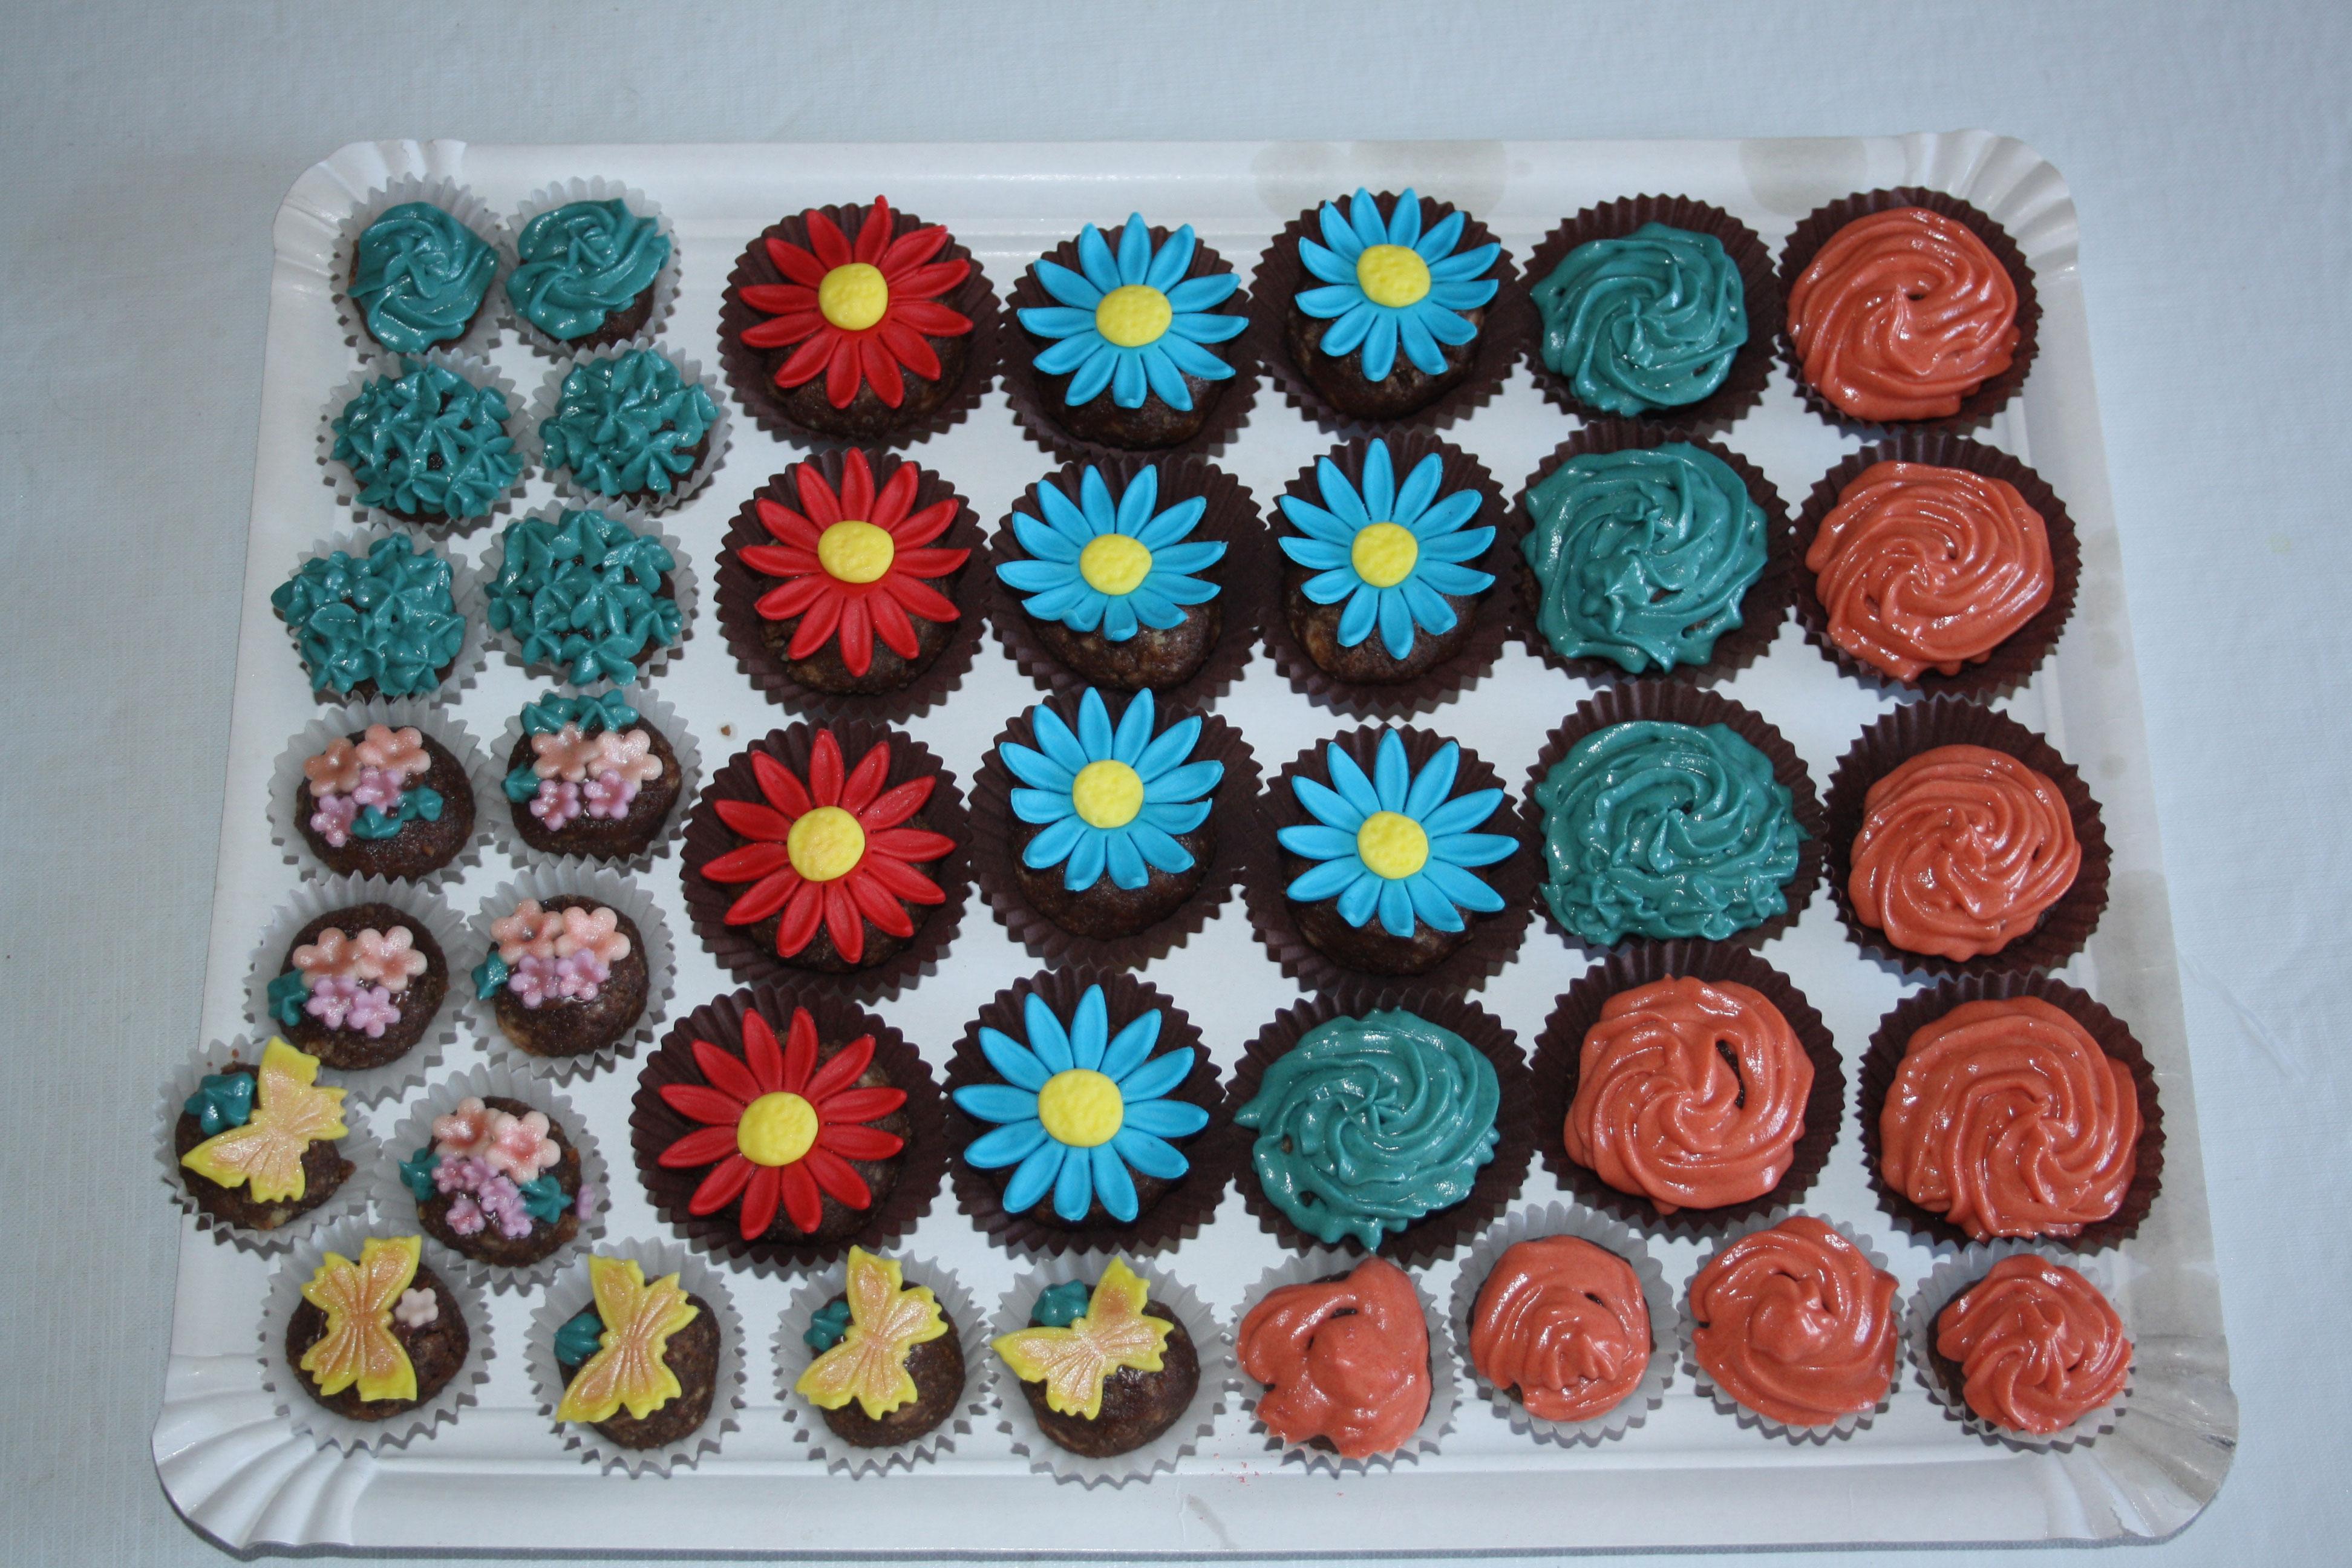 cakepops-flores-variadas-en-capsulas-papel